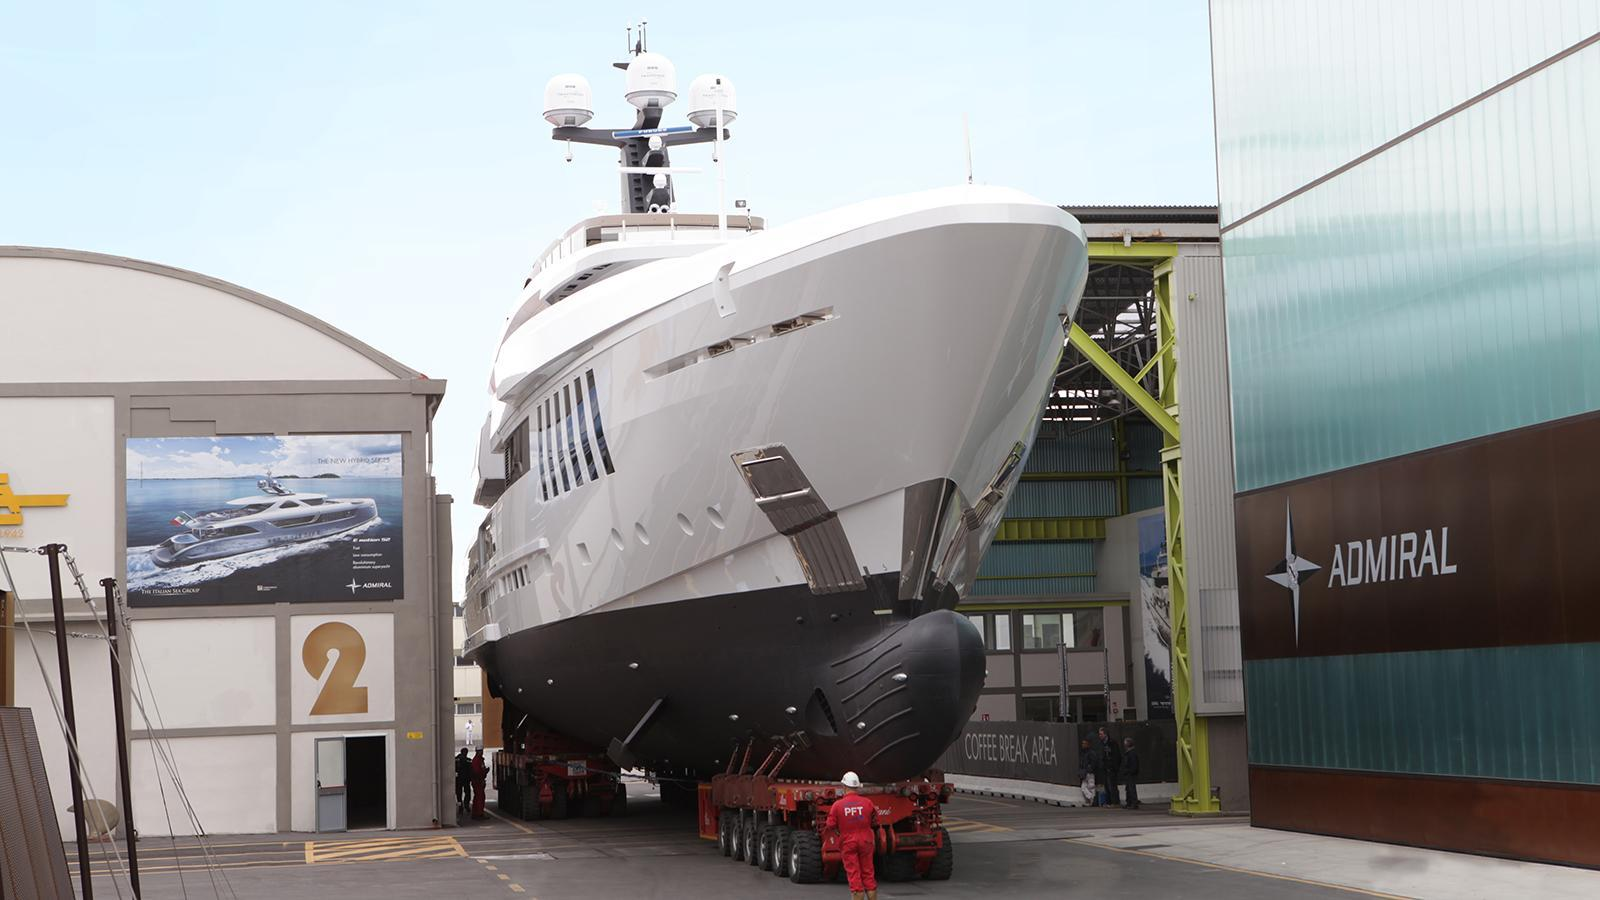 ouranos-motor-yacht-admiral-italian-sea-group-2016-50m-bow-shipyard